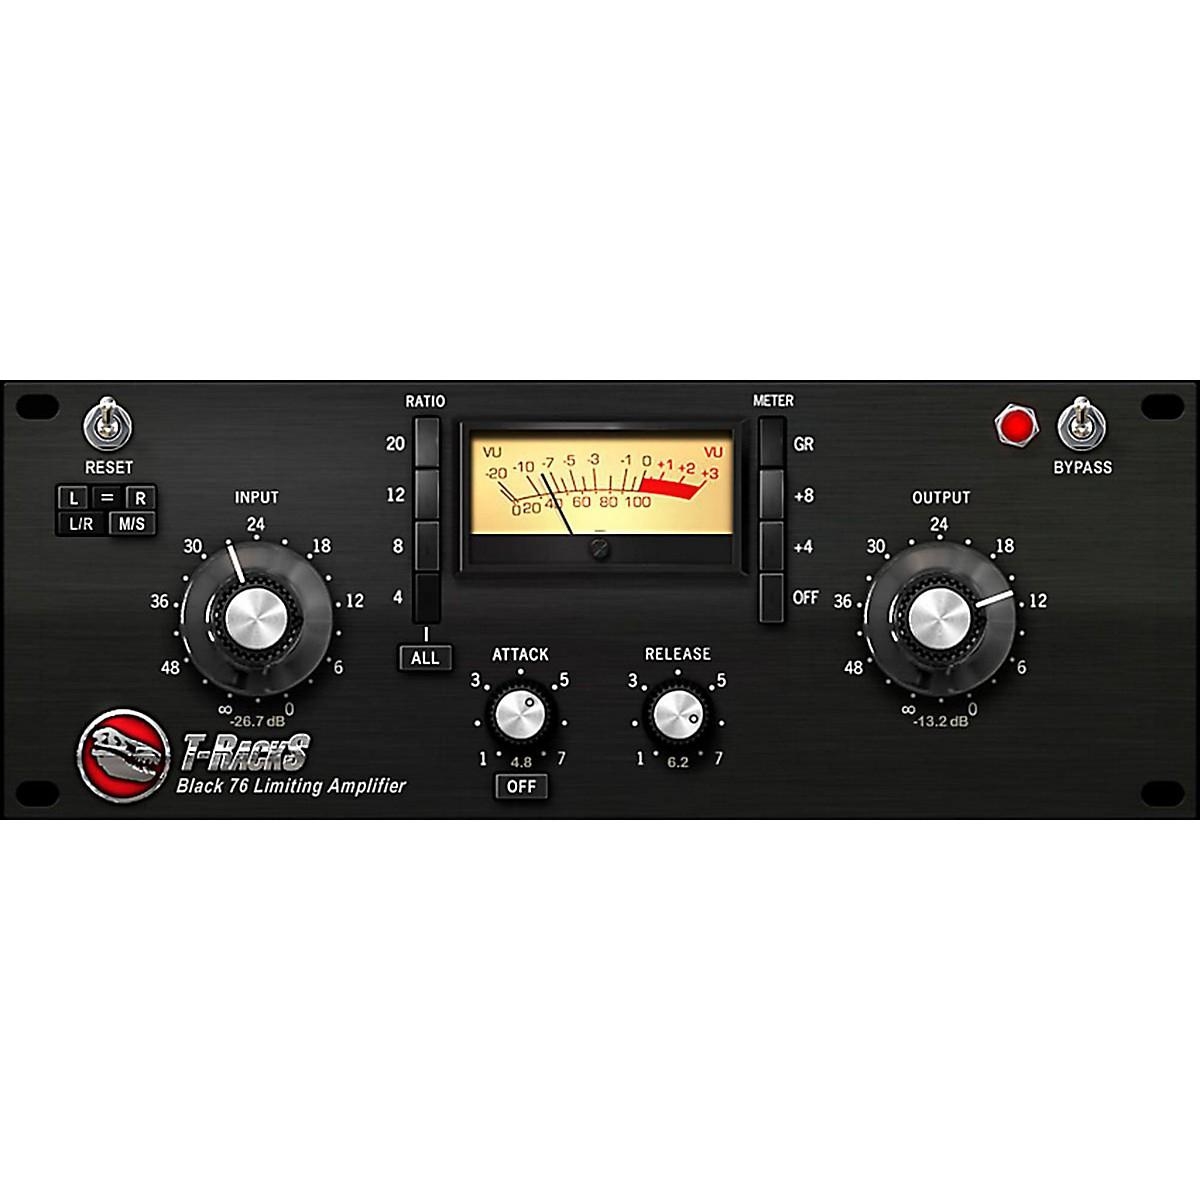 IK Multimedia Black 76 Limiting Amplifier Software Download